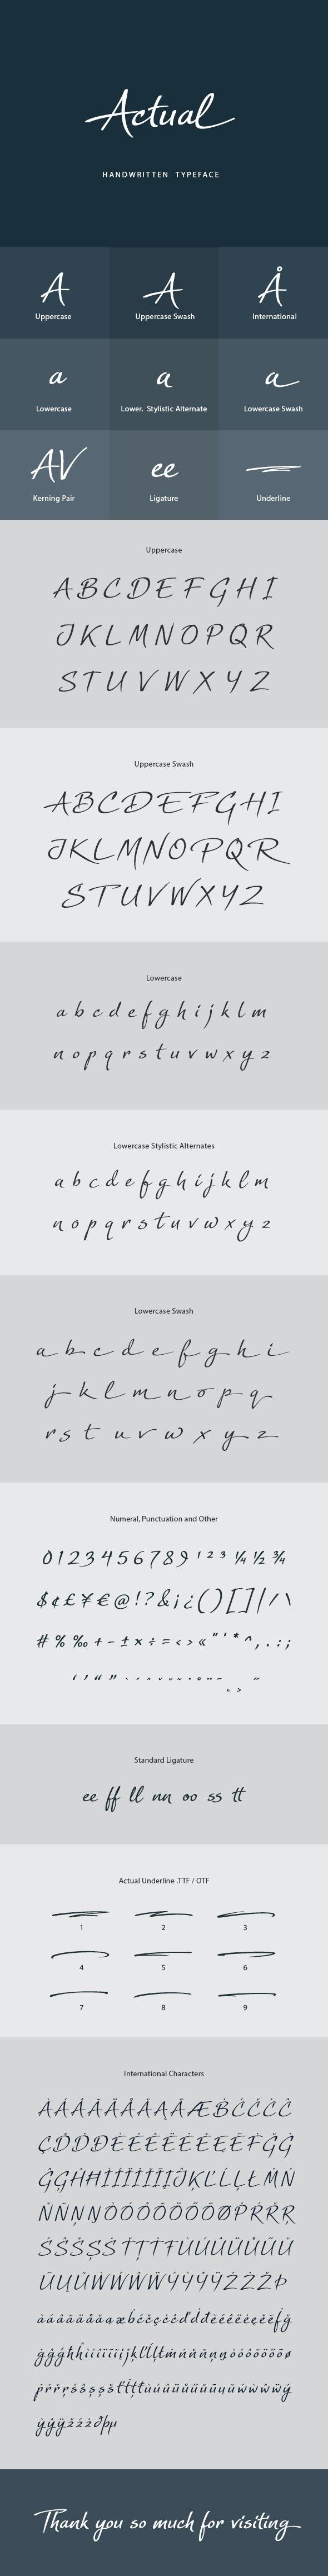 Actual Handwritten Font - Handwriting Fonts